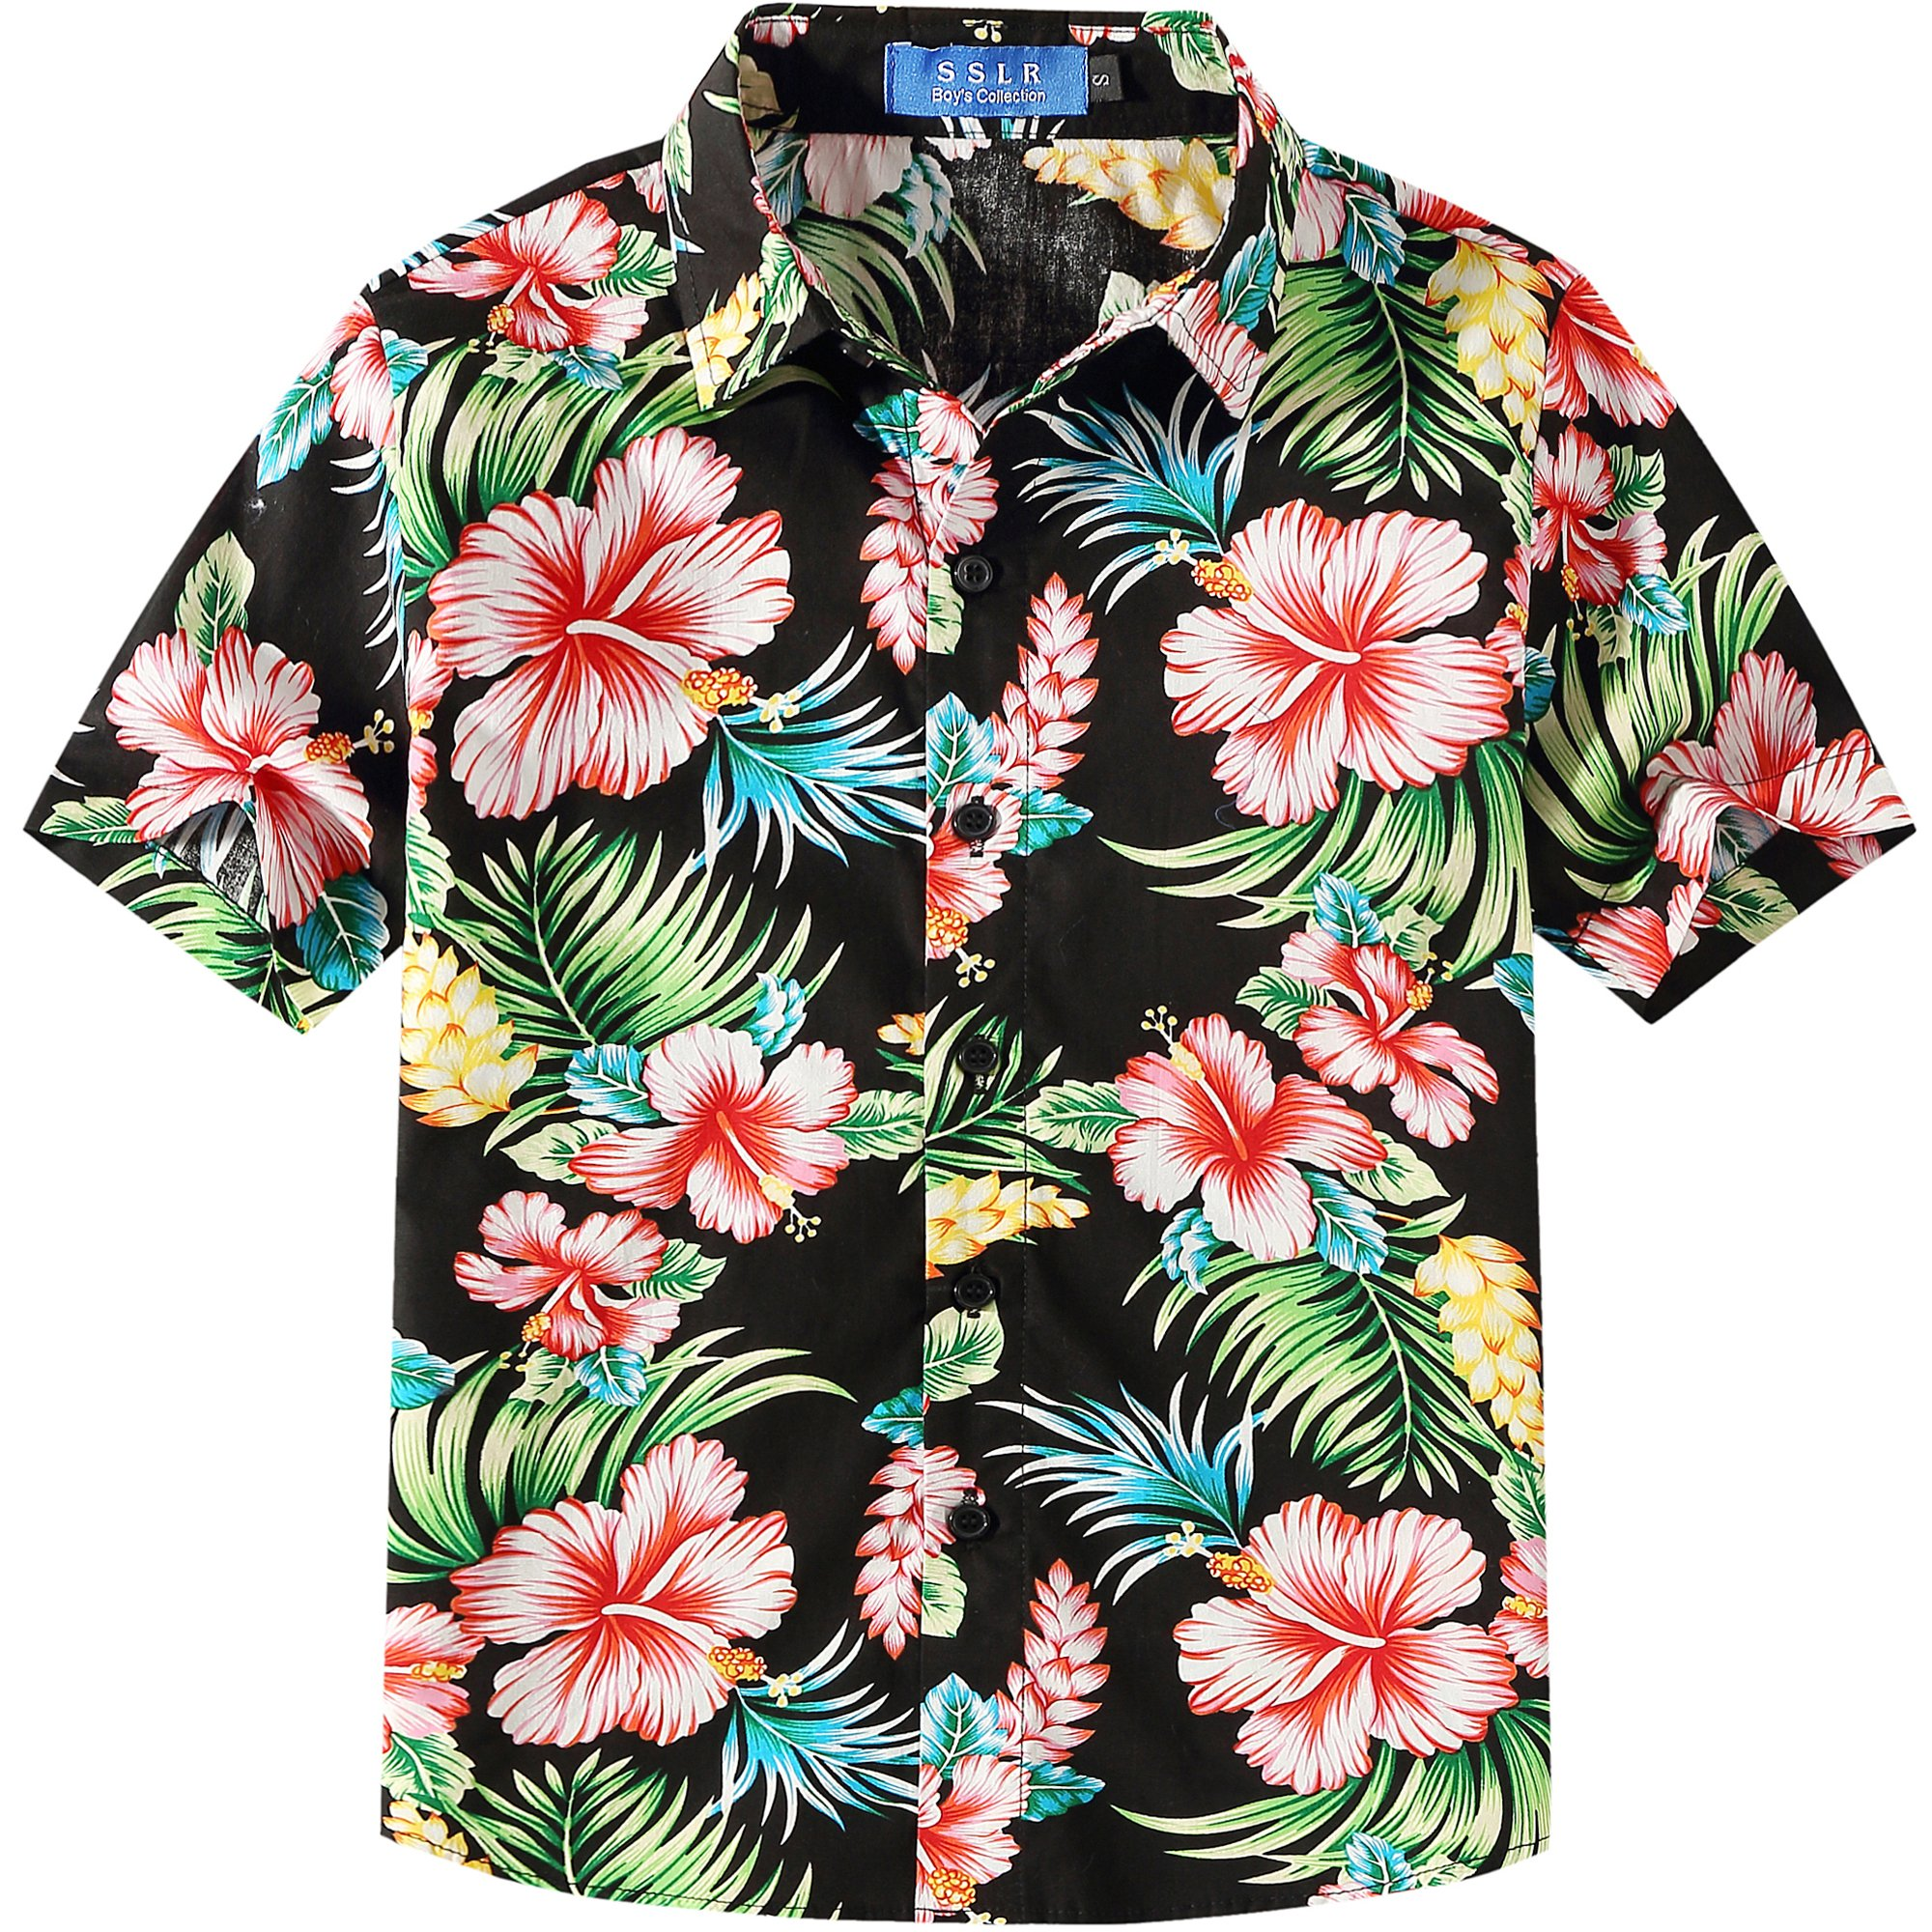 SSLR Big Boy's Hibiscus Cotton Short Sleeve Casual Button Down Hawaiian Shirt (Small(8), Black)